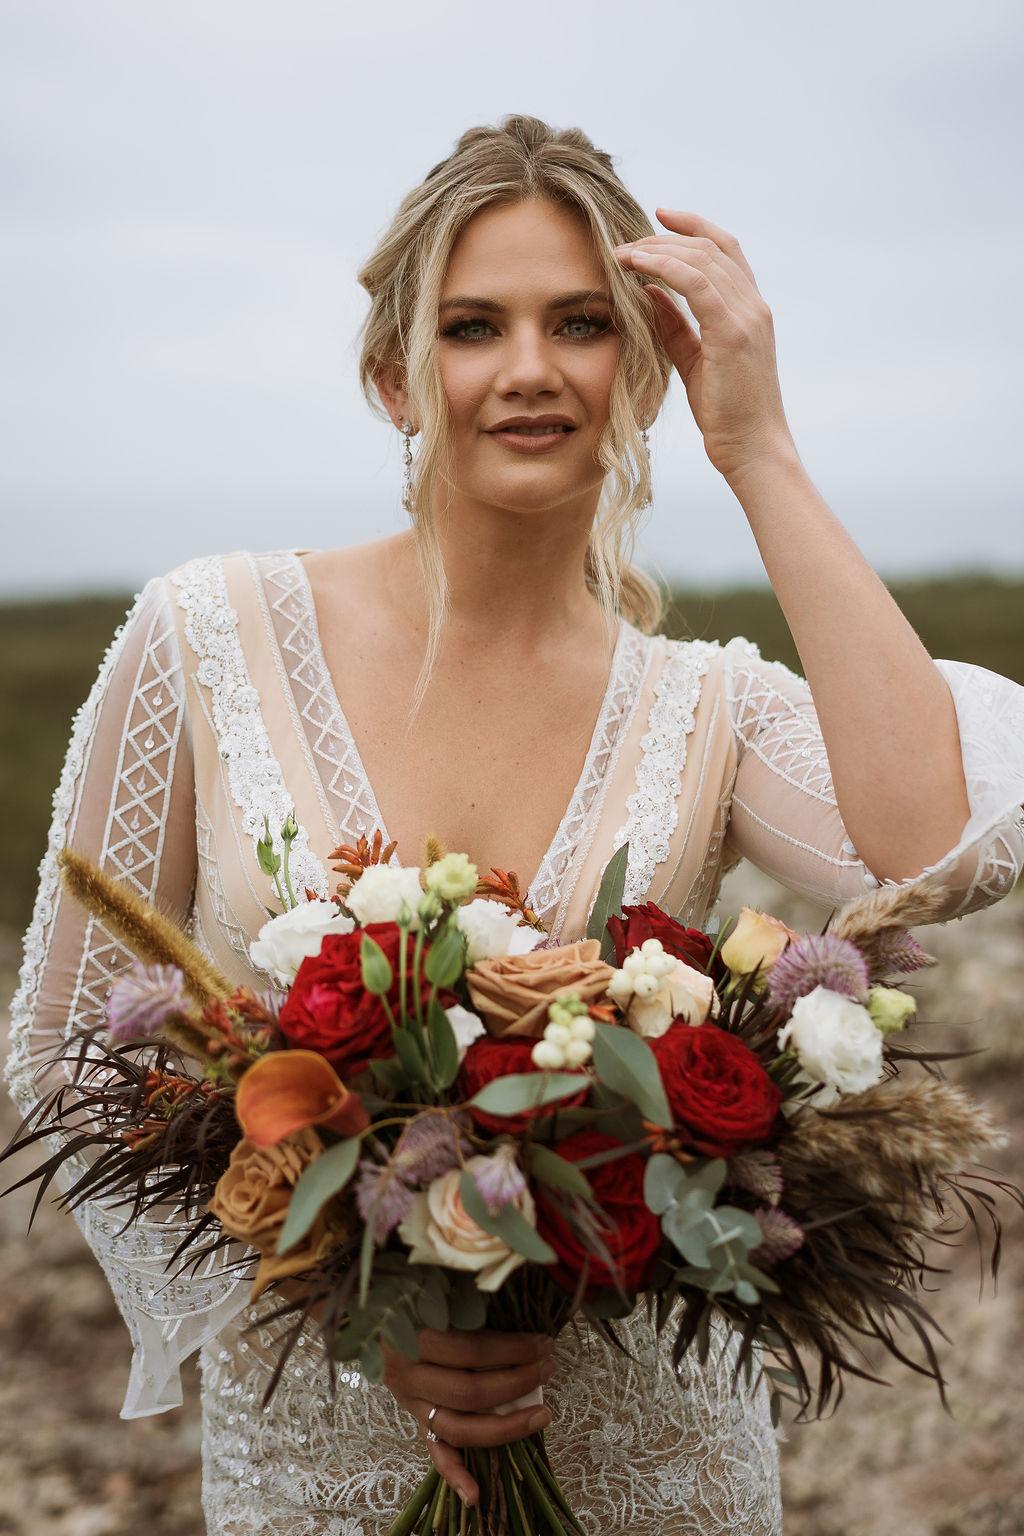 sunshine-coast-wedding-photography-terri-hanlon-photography-sunshine-brides-suncoast-flowers-allira-ashwell-12